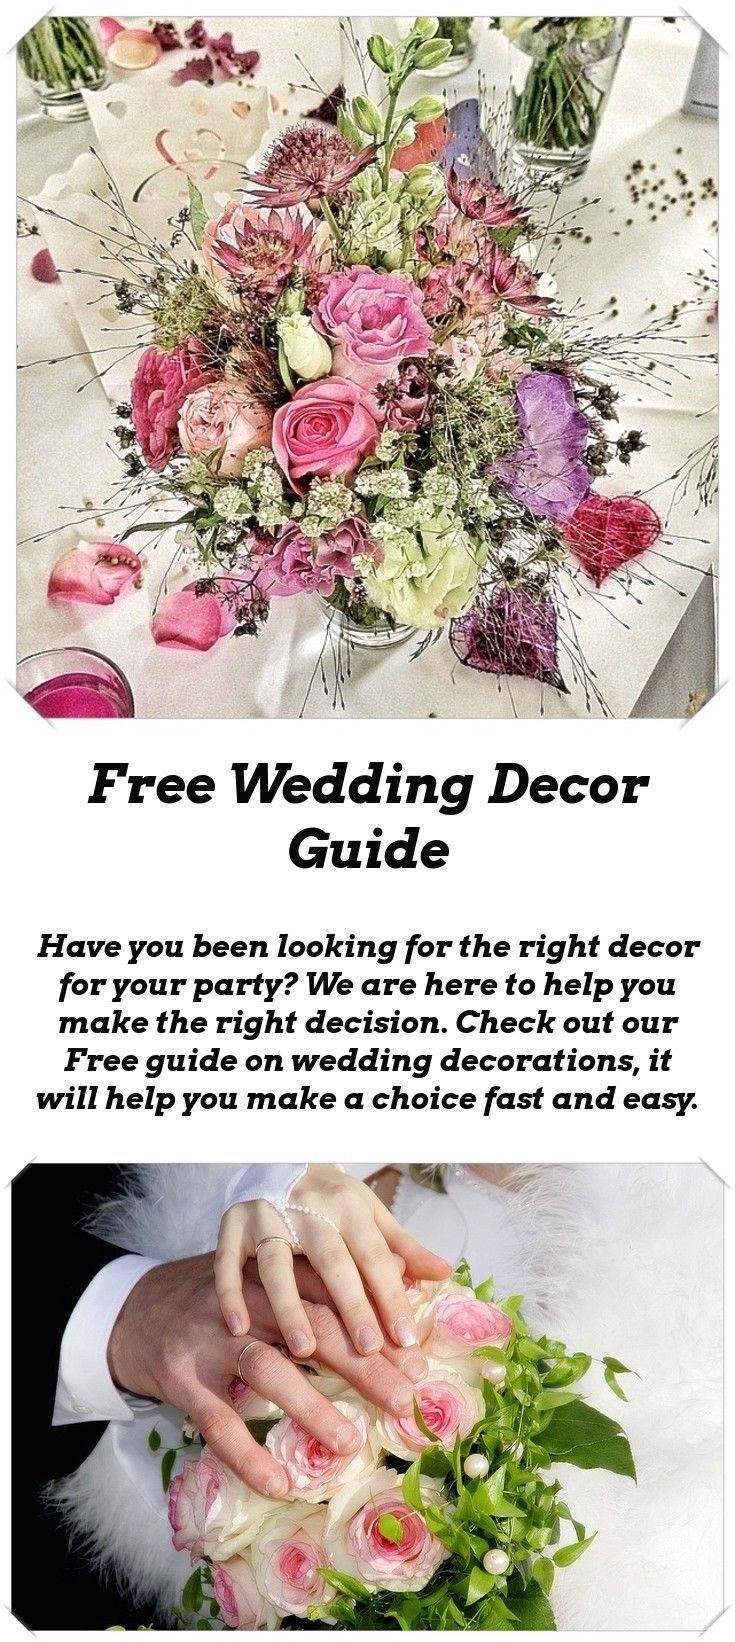 Wedding decorations to make  Decoration Ideas For Your Wedding  Wedding Decor Inspiration